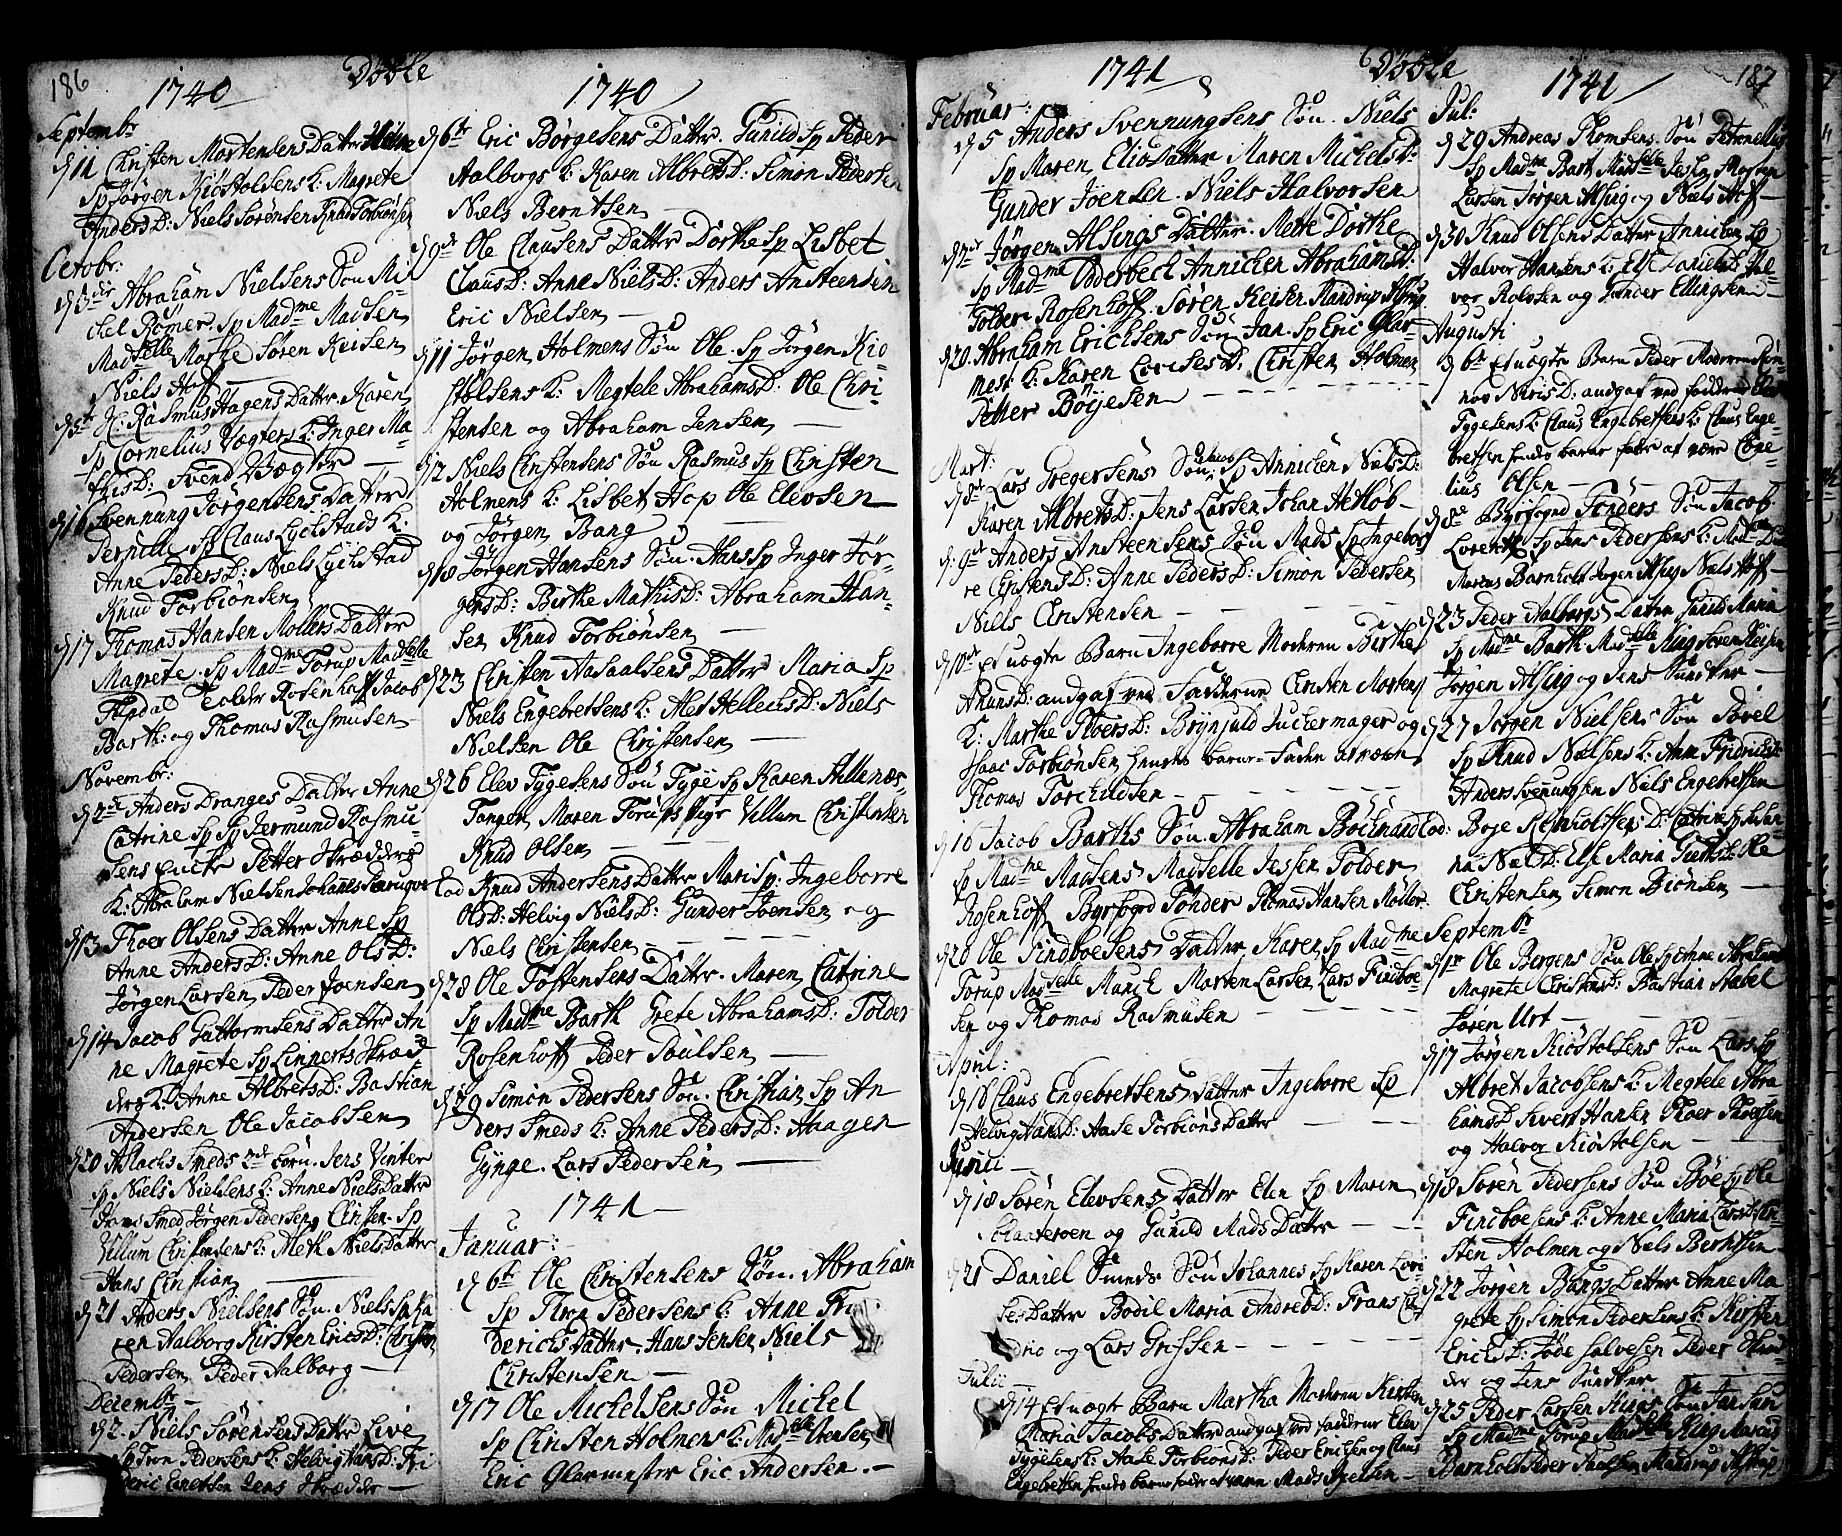 SAKO, Kragerø kirkebøker, F/Fa/L0001: Ministerialbok nr. 1, 1702-1766, s. 186-187